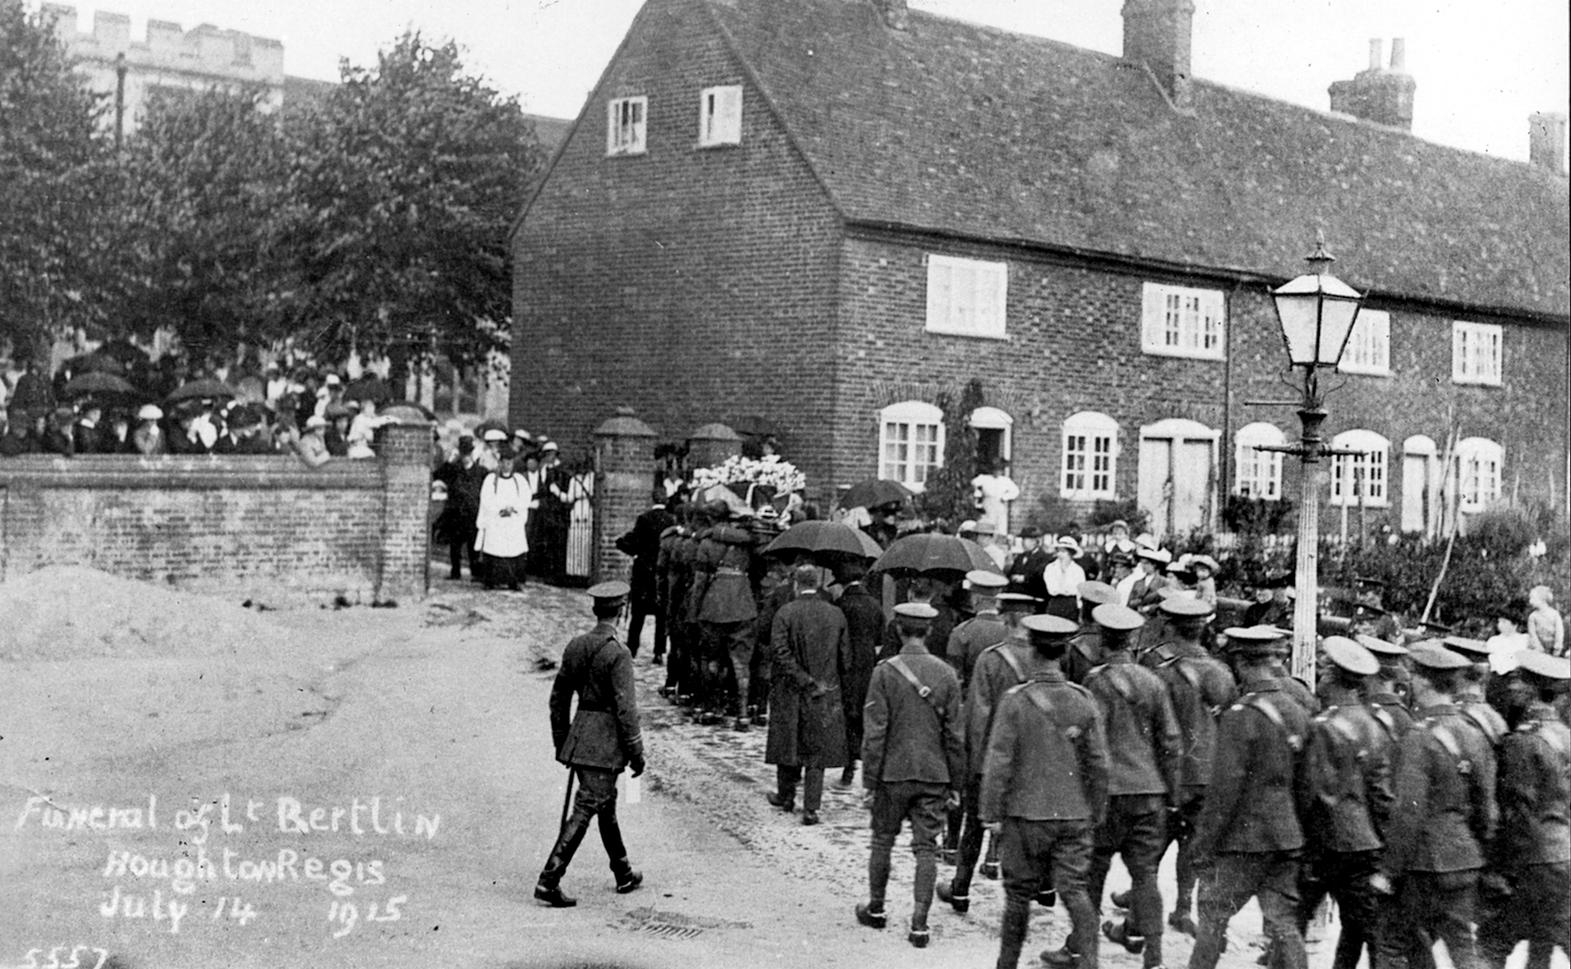 Hugh Bertlin's Funeral